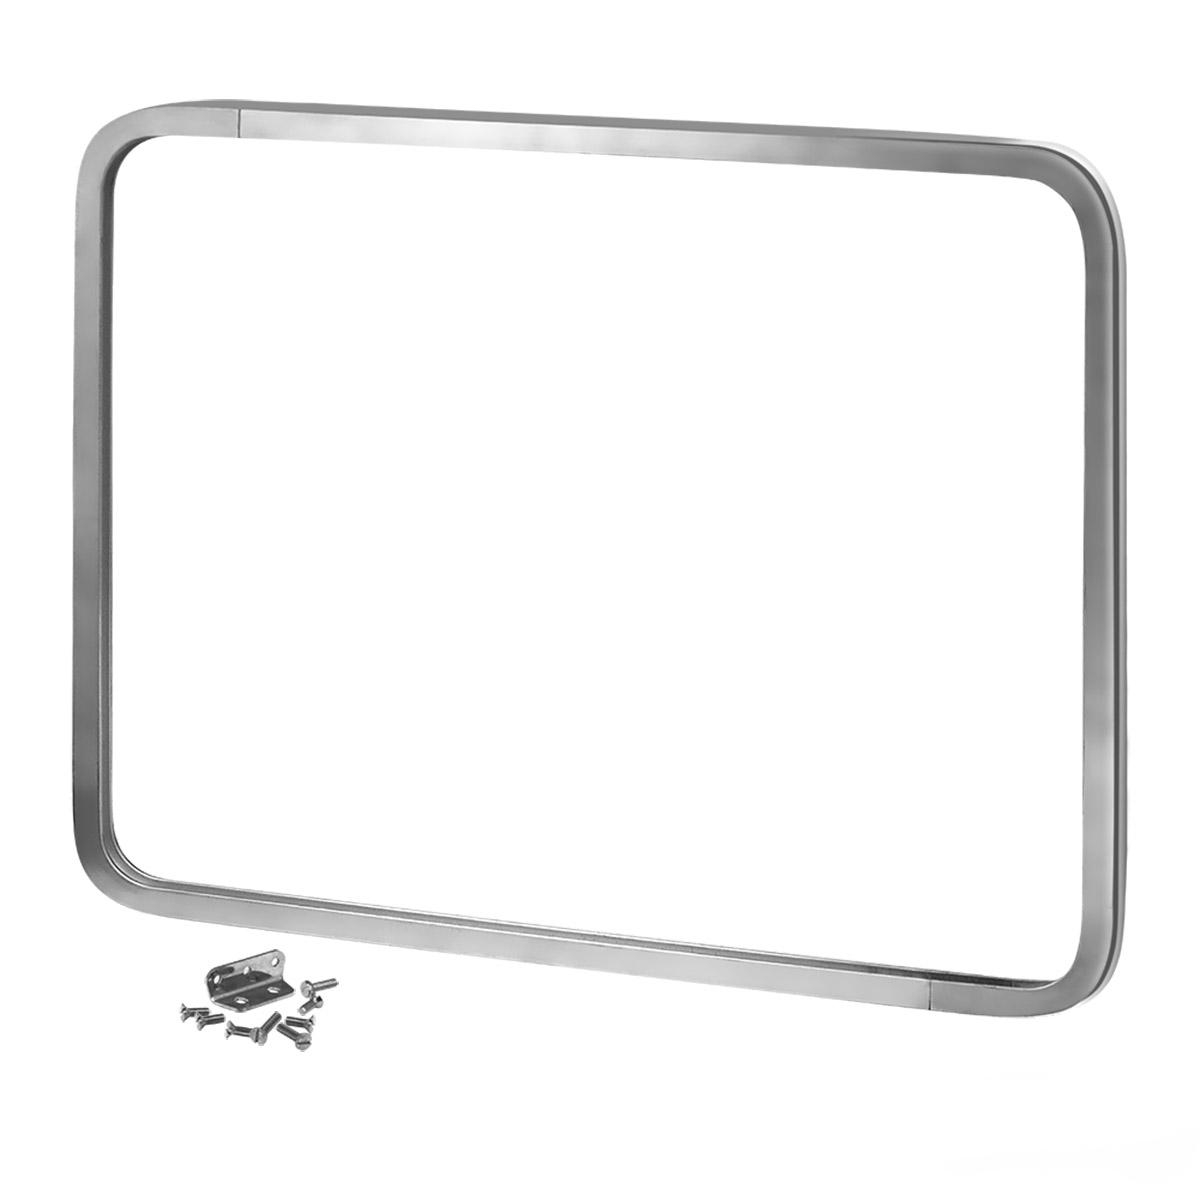 cadre de pop-out de Combi Split en aluminium